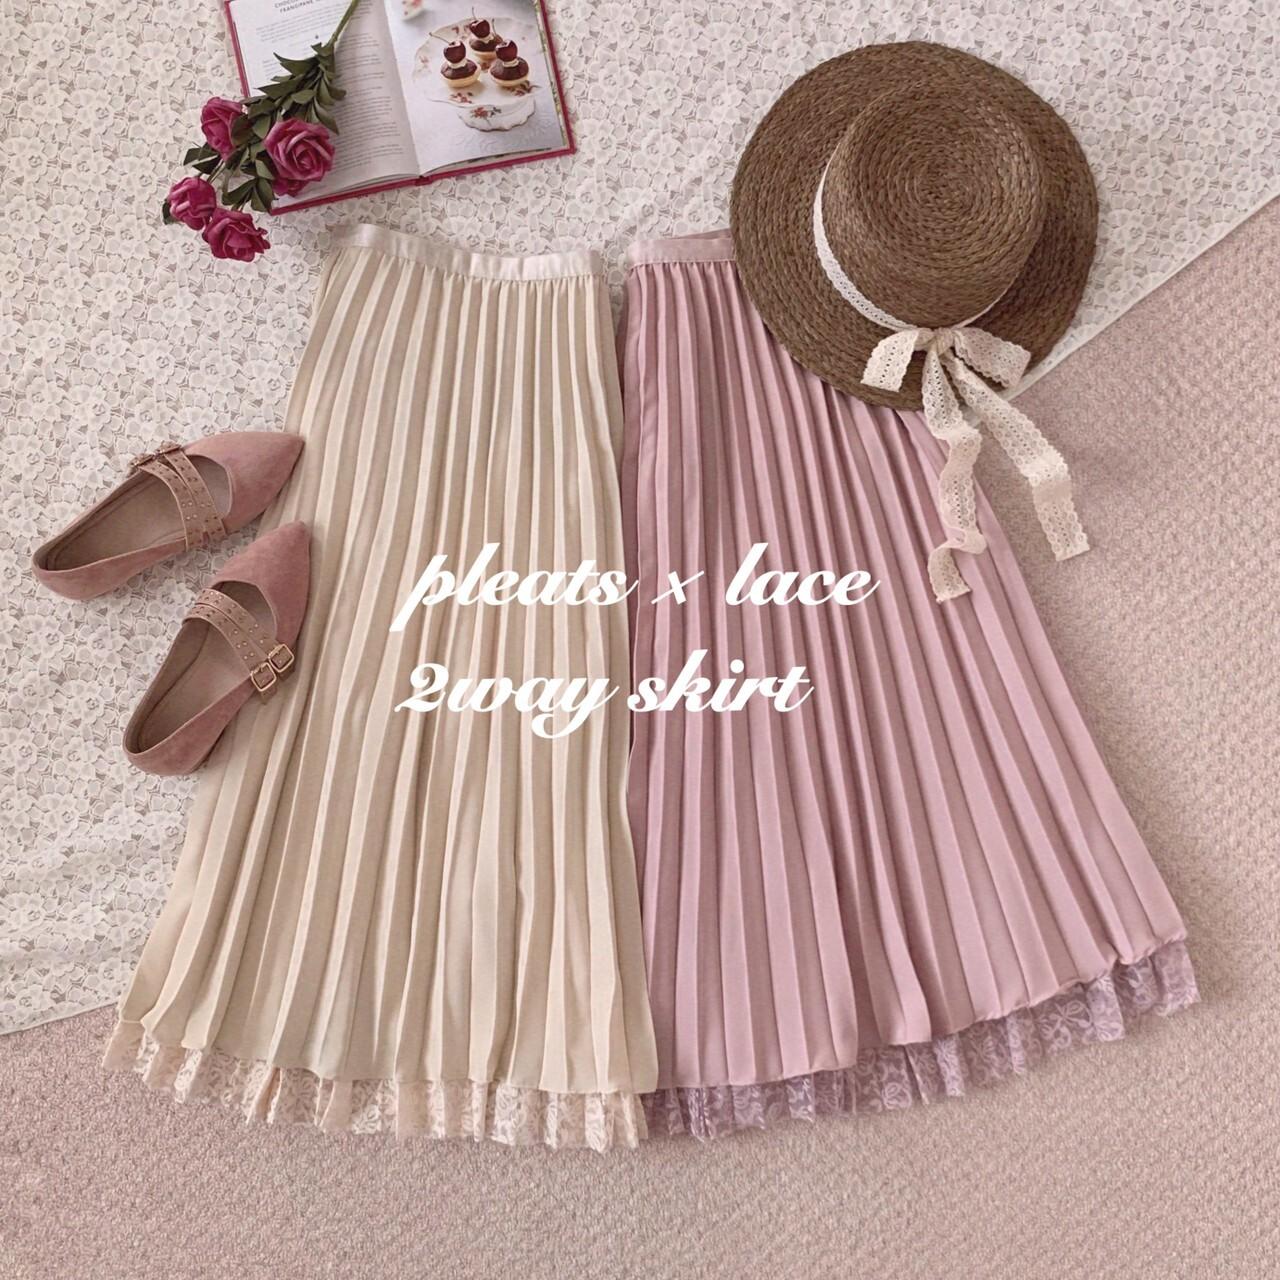 【meltie】pleats × lace 2way skirt